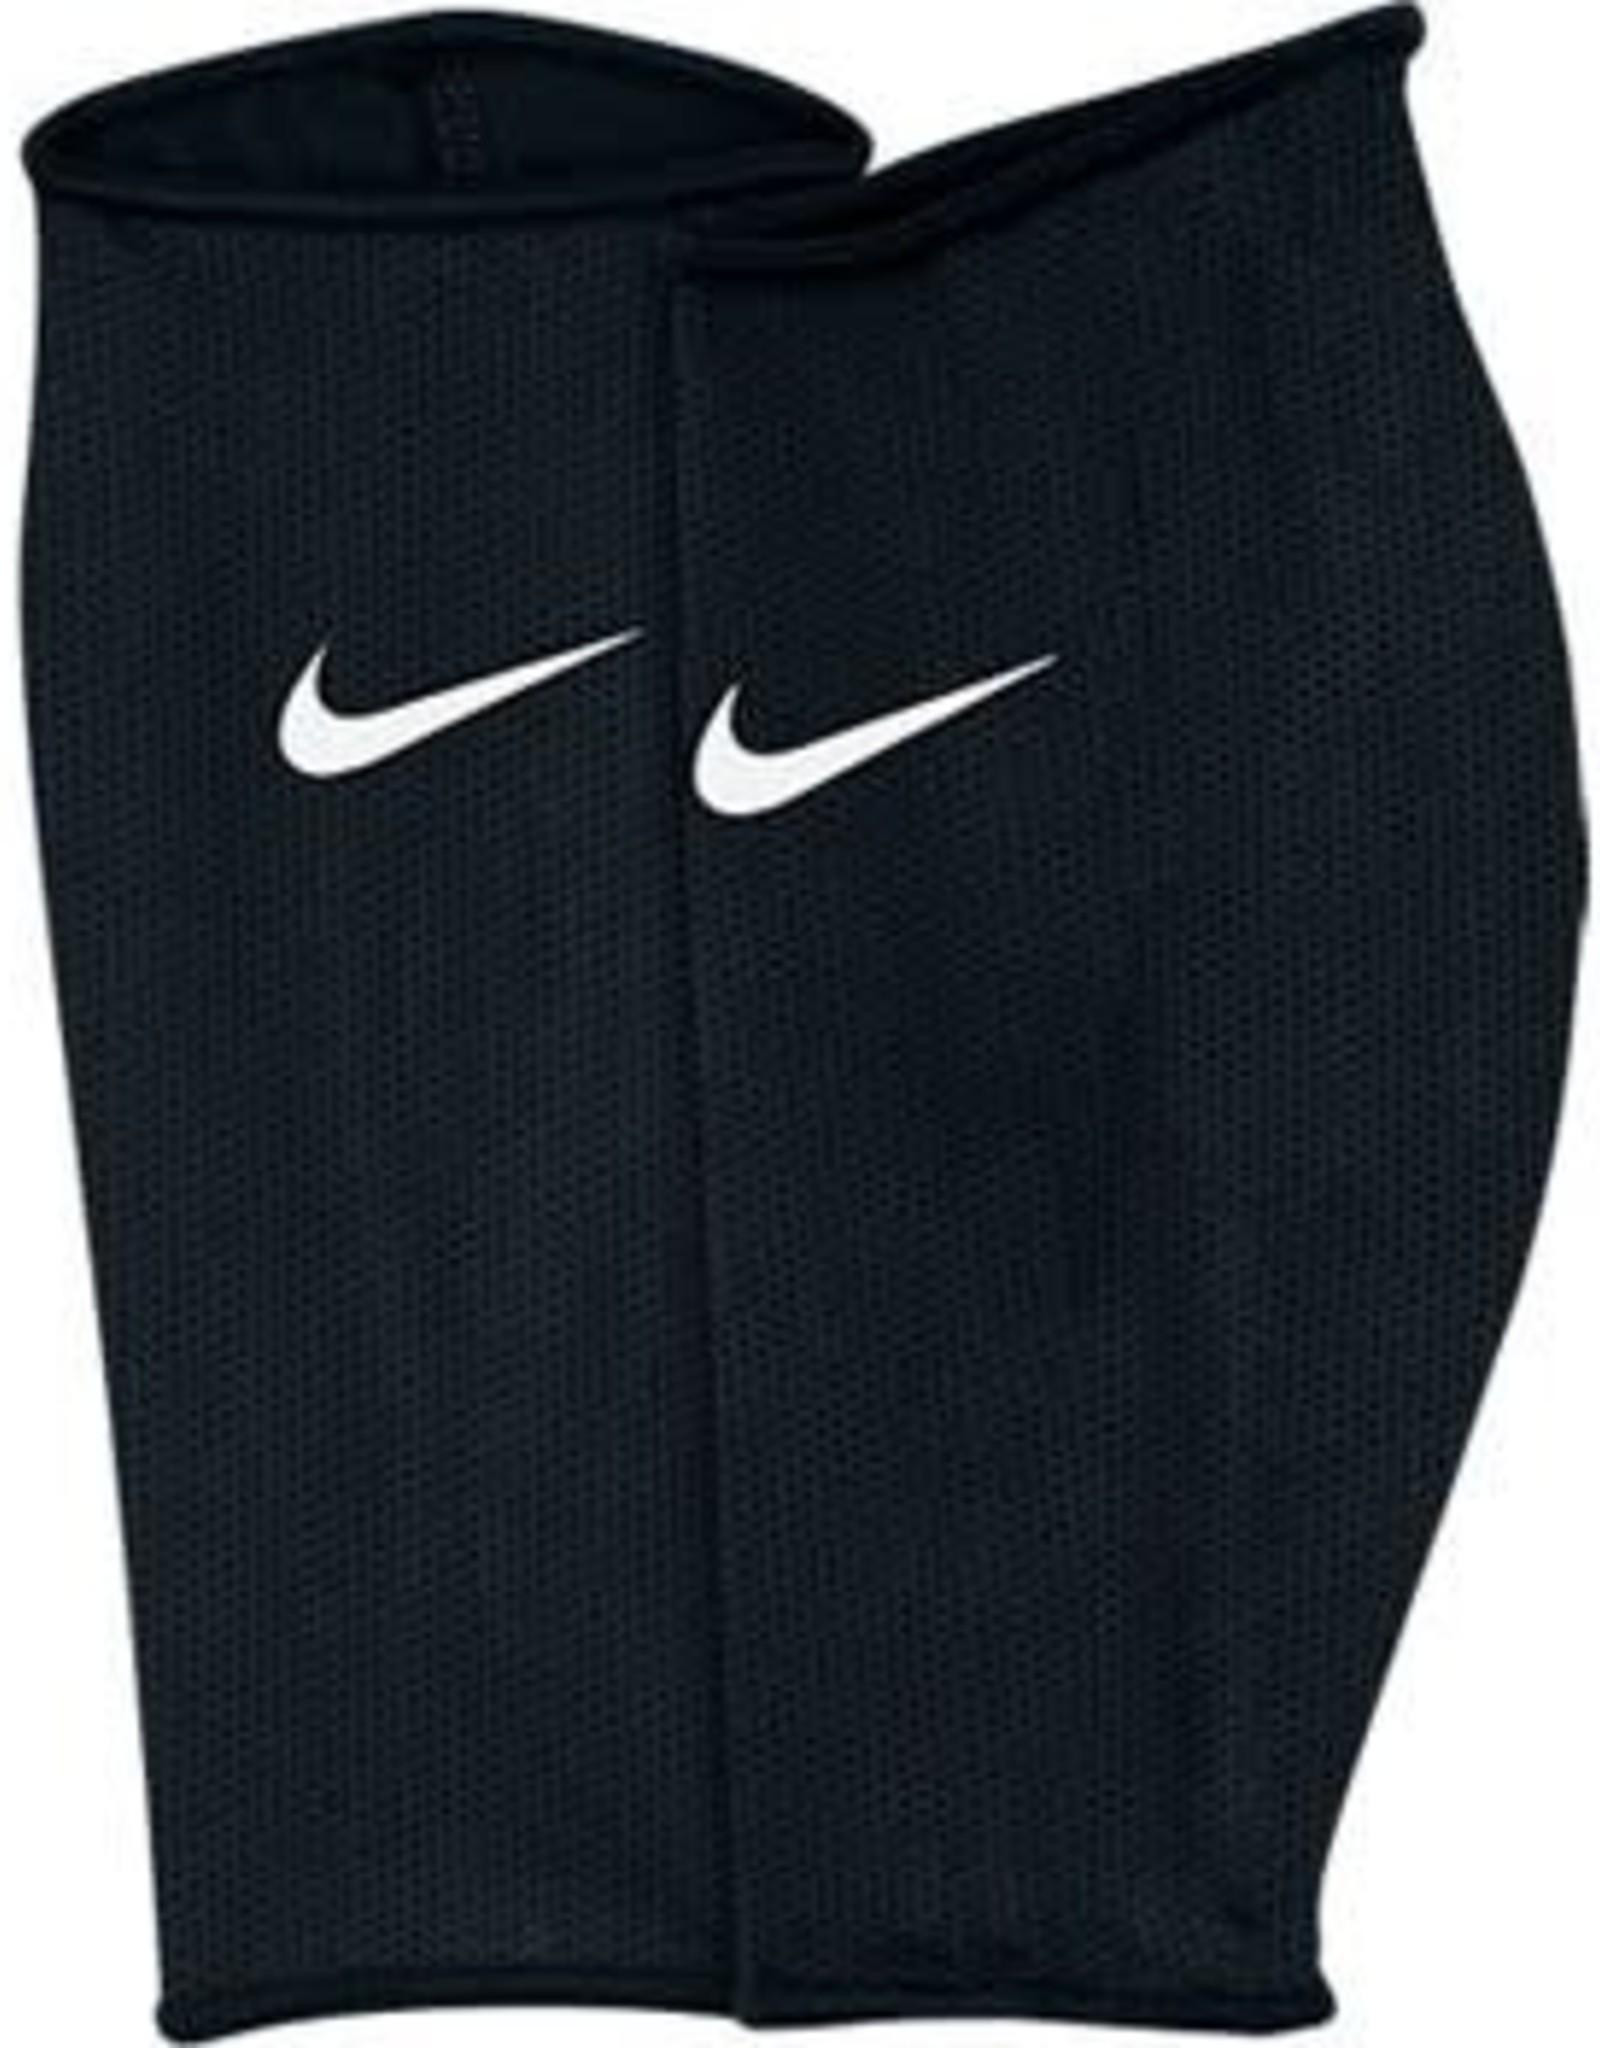 Nike Nike Guard Lock Sleeves